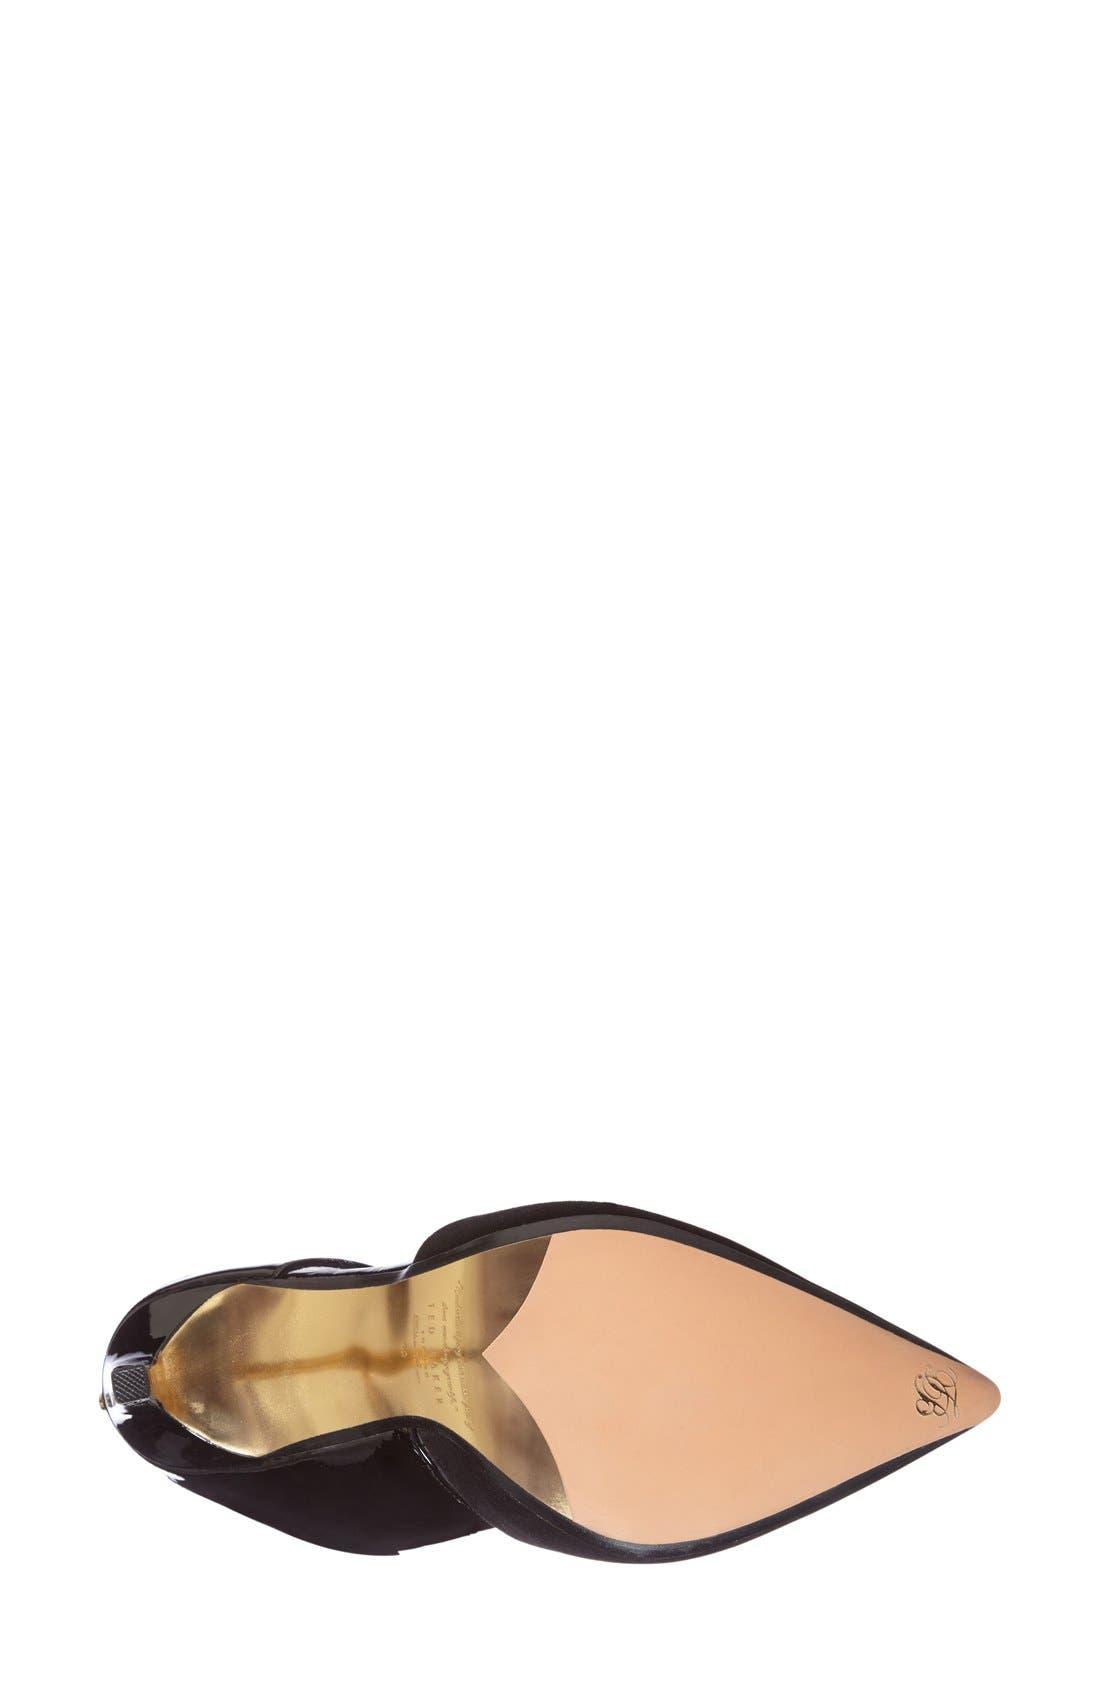 TED BAKER LONDON,                             'Amenoa' Cutout Pump,                             Alternate thumbnail 4, color,                             250